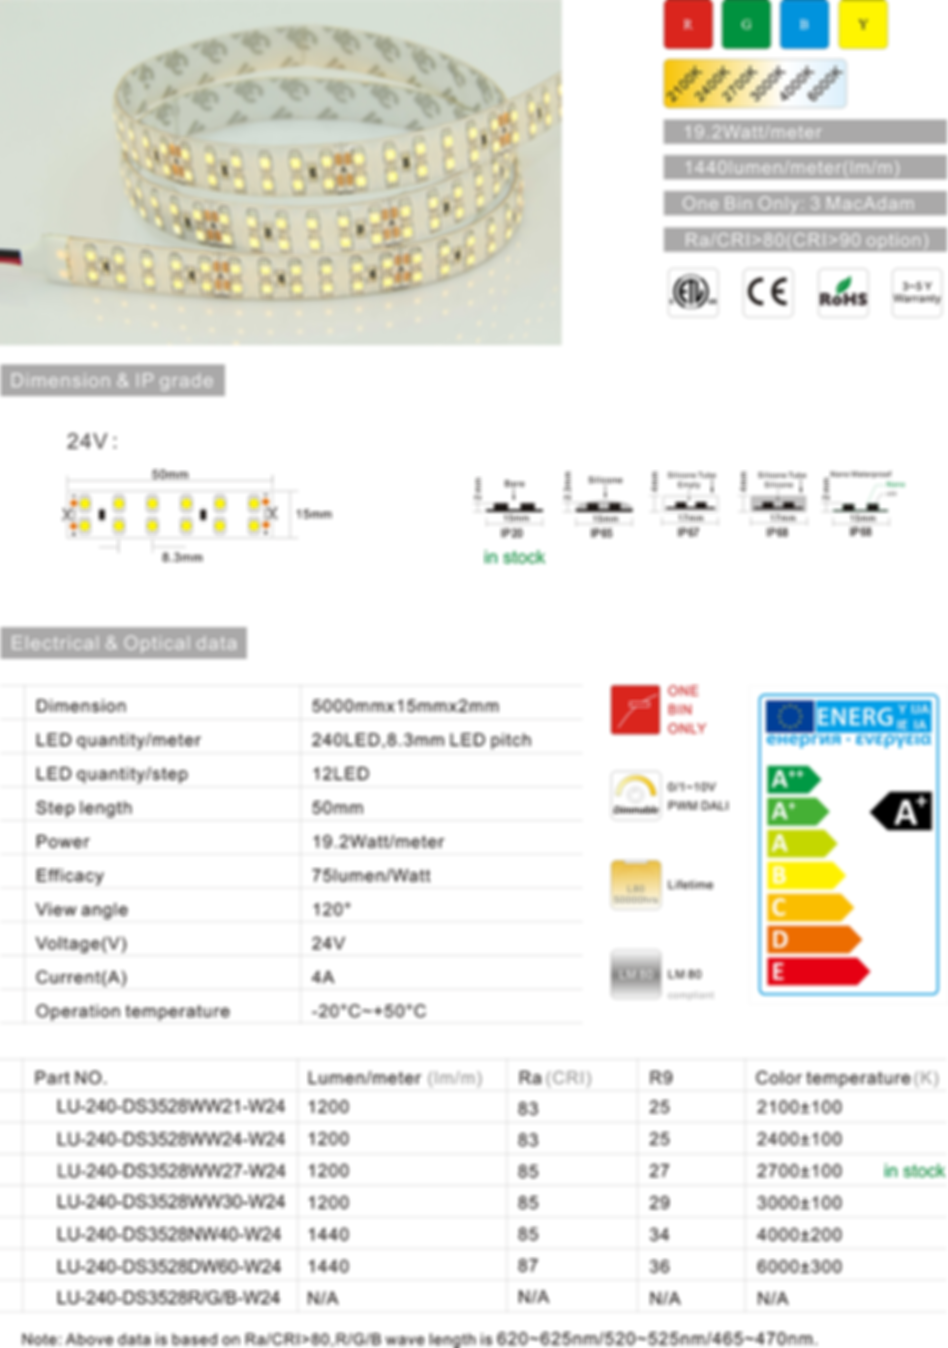 24V Dual LED strips in GCC region